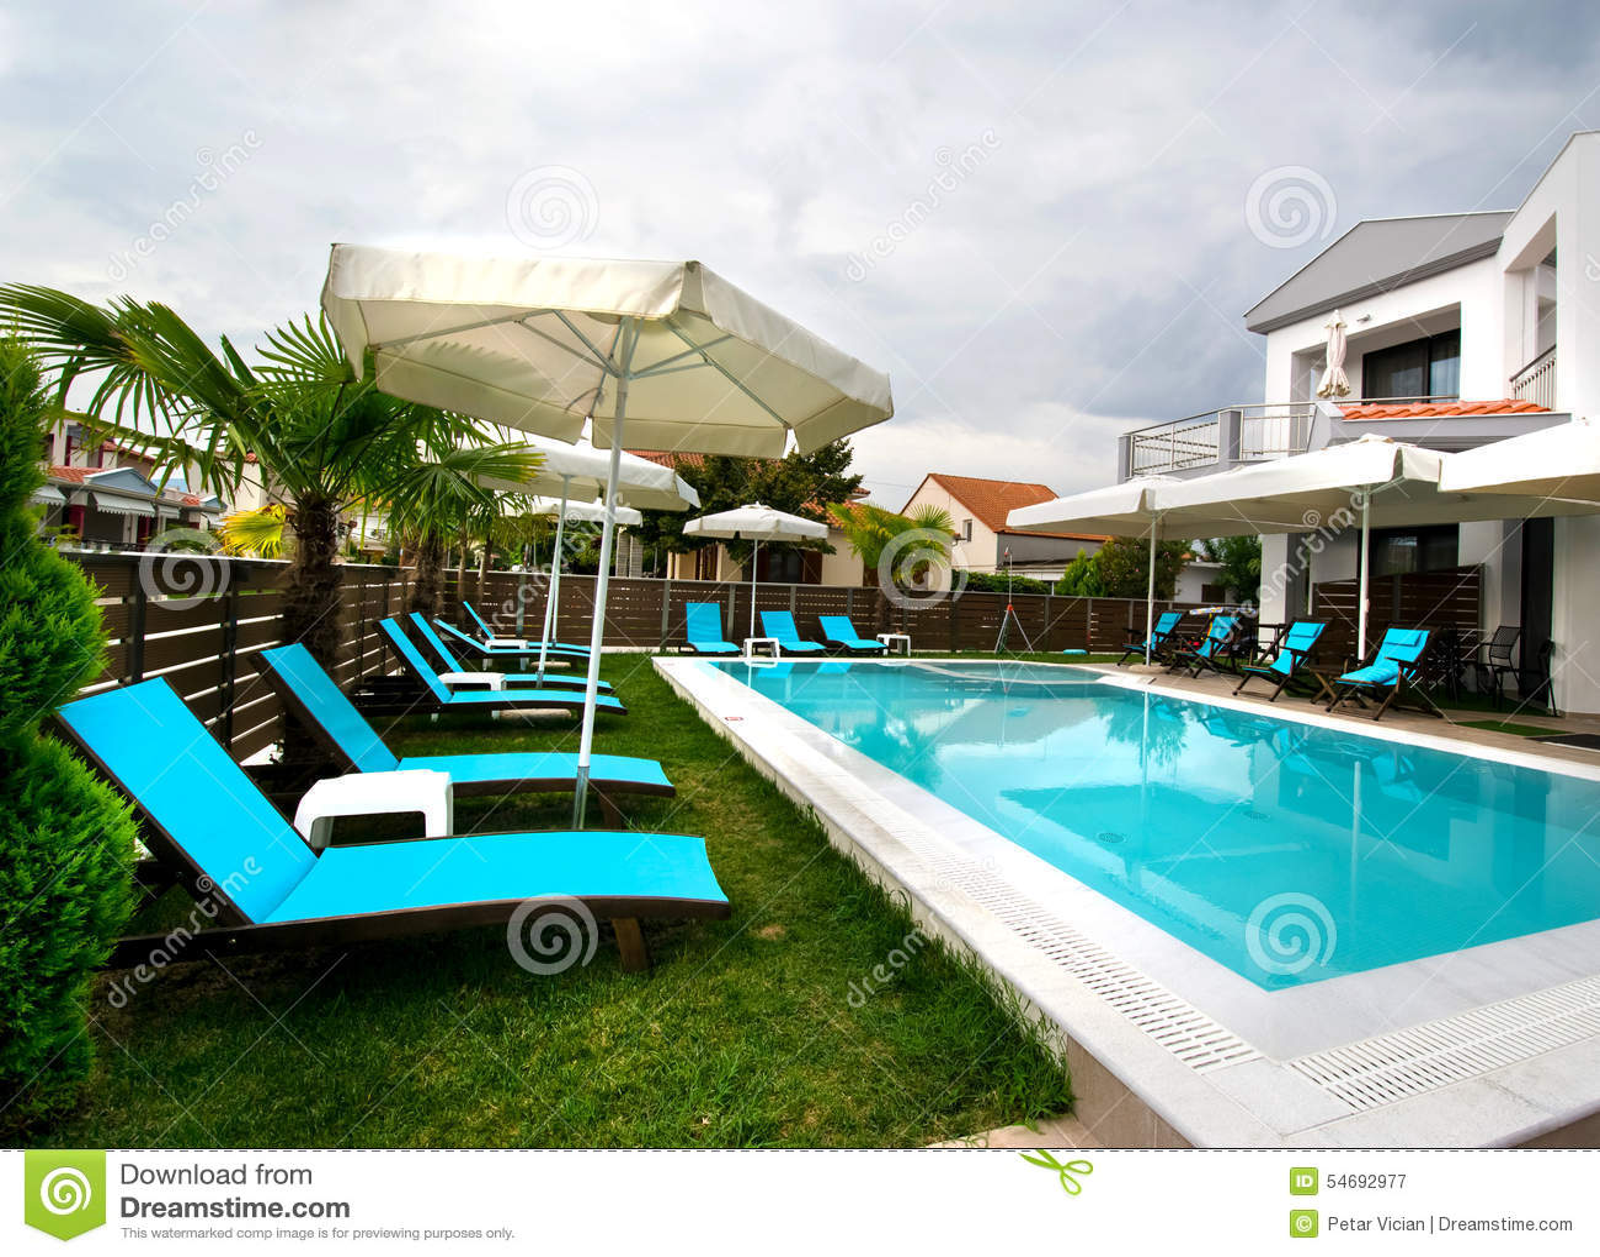 Piscina moderna de la casa de la residencia imagen de for Casa moderna piscina